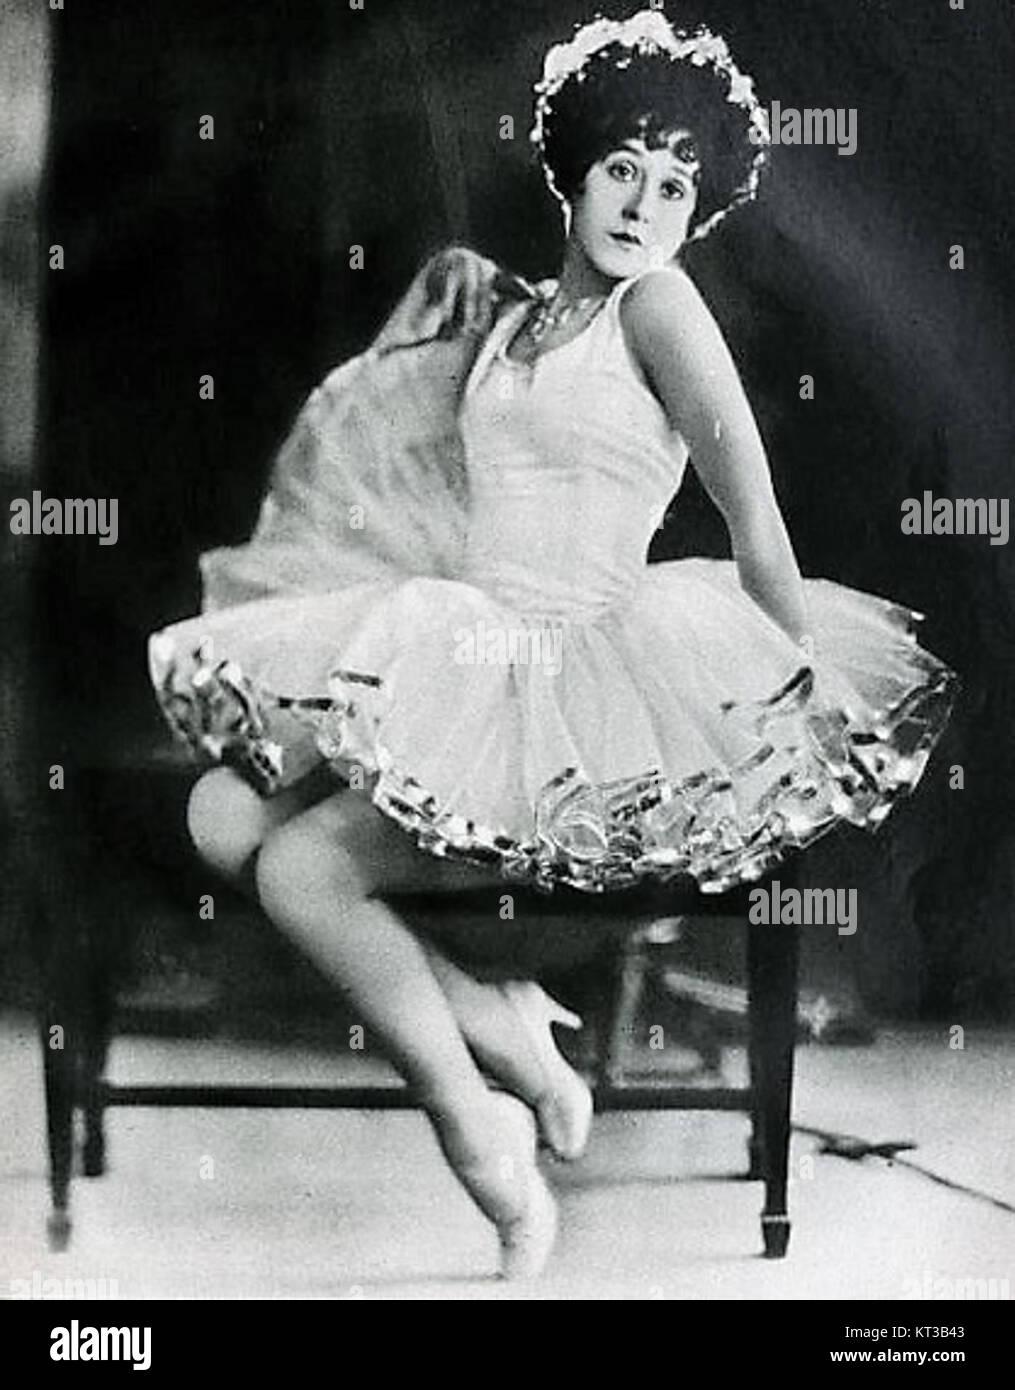 Alberta Vaughn